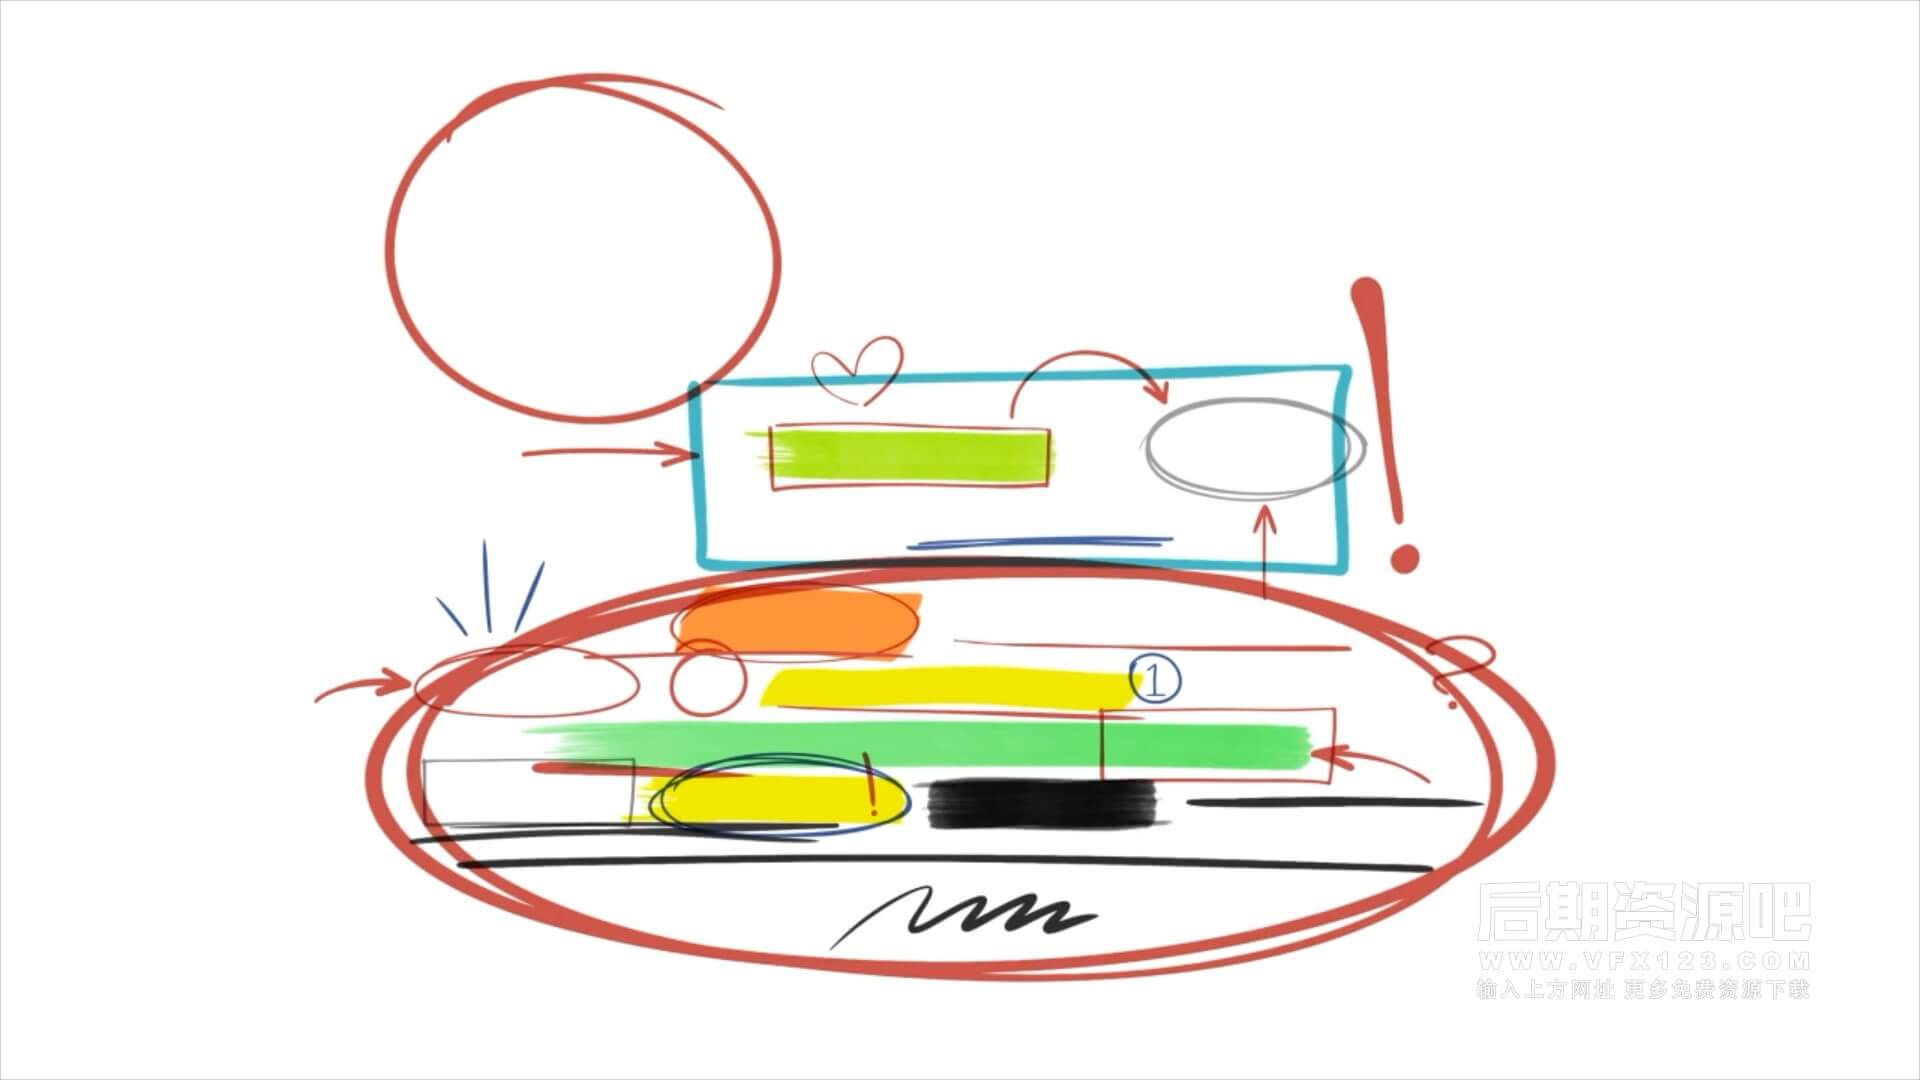 AE模板 485个手绘涂鸦素描动画元素包 Hand Drawings Pack